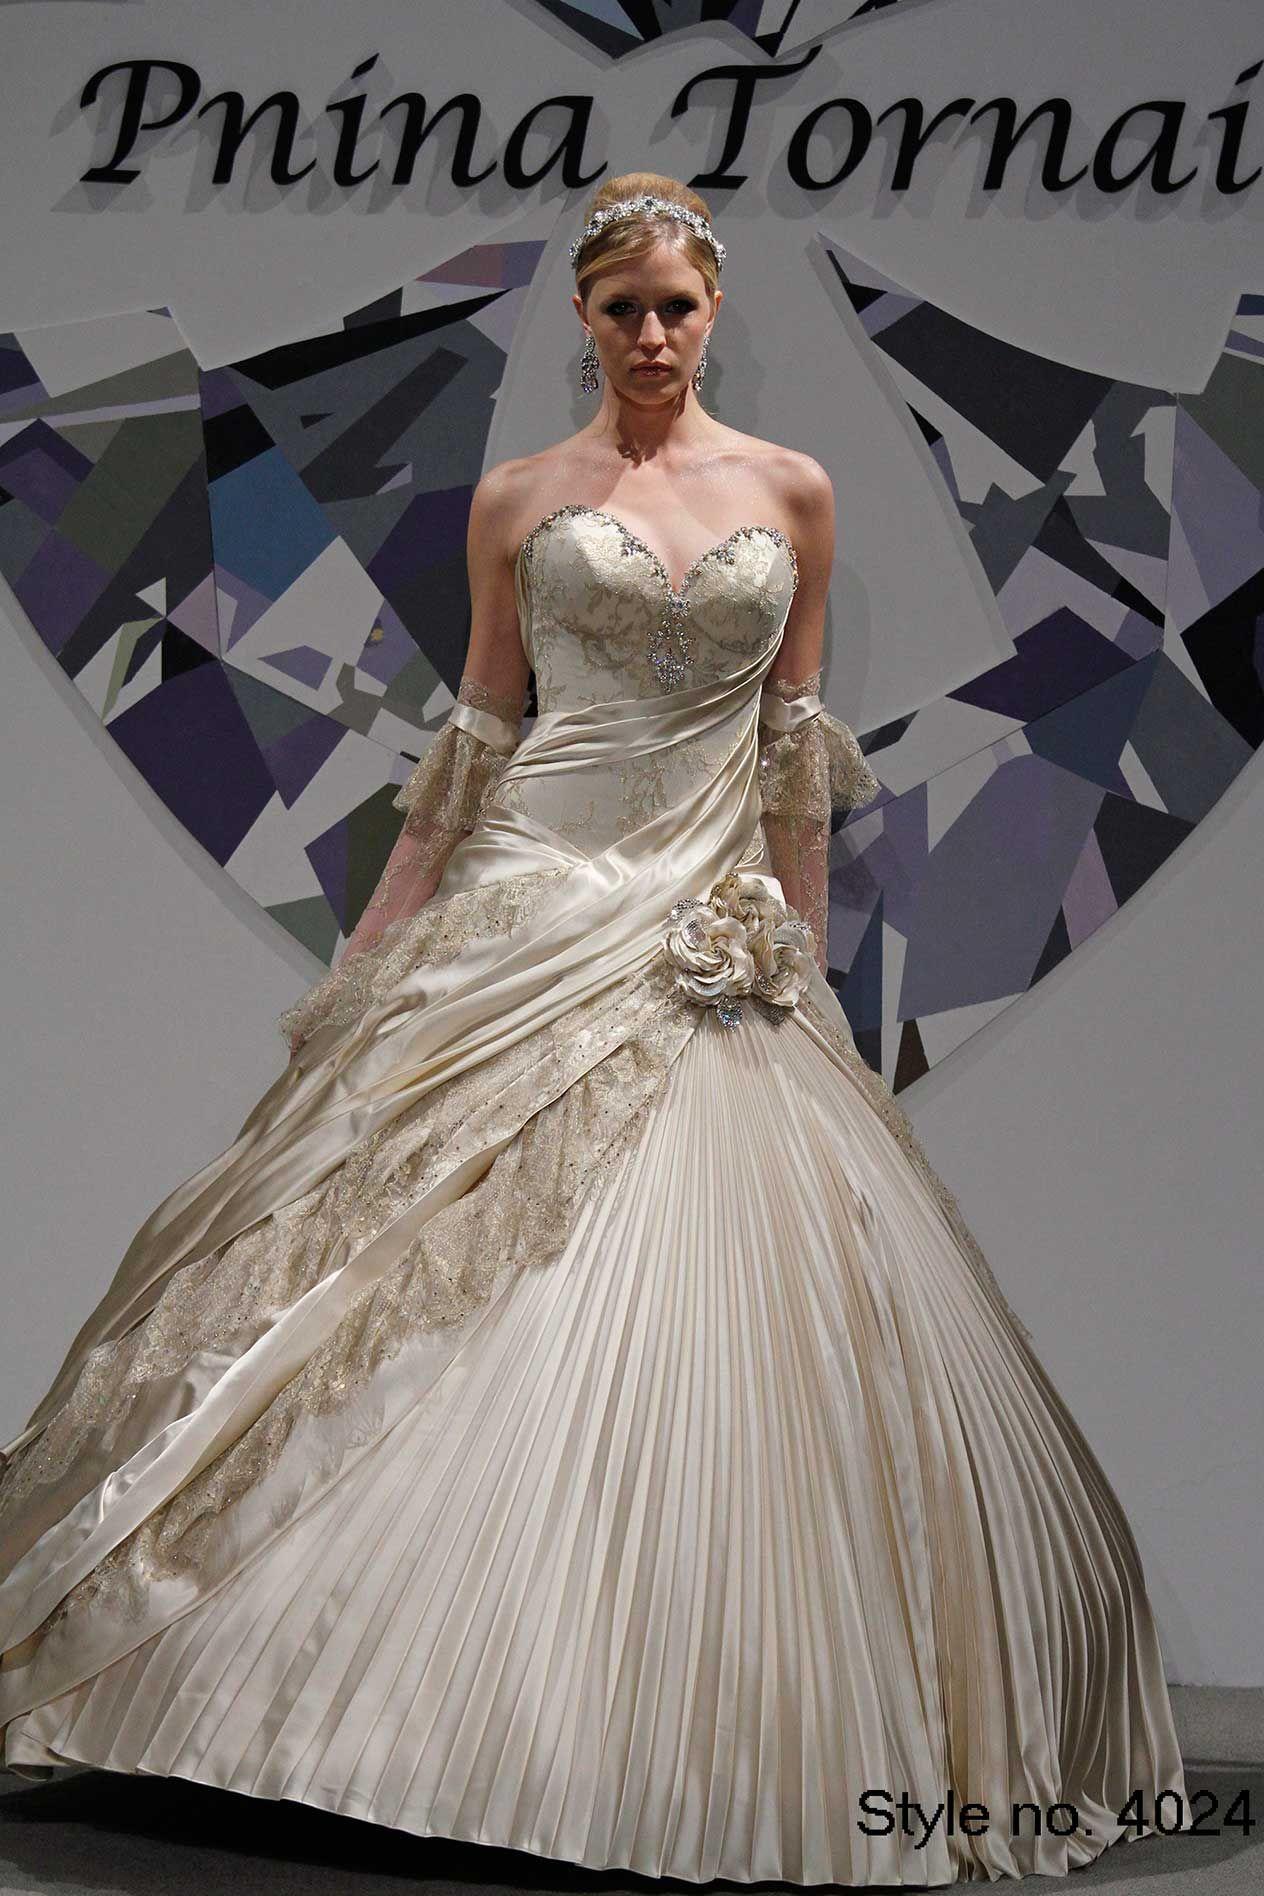 2015 Pnina Tornai Ball Gown Wedding Dresses Sweetheart